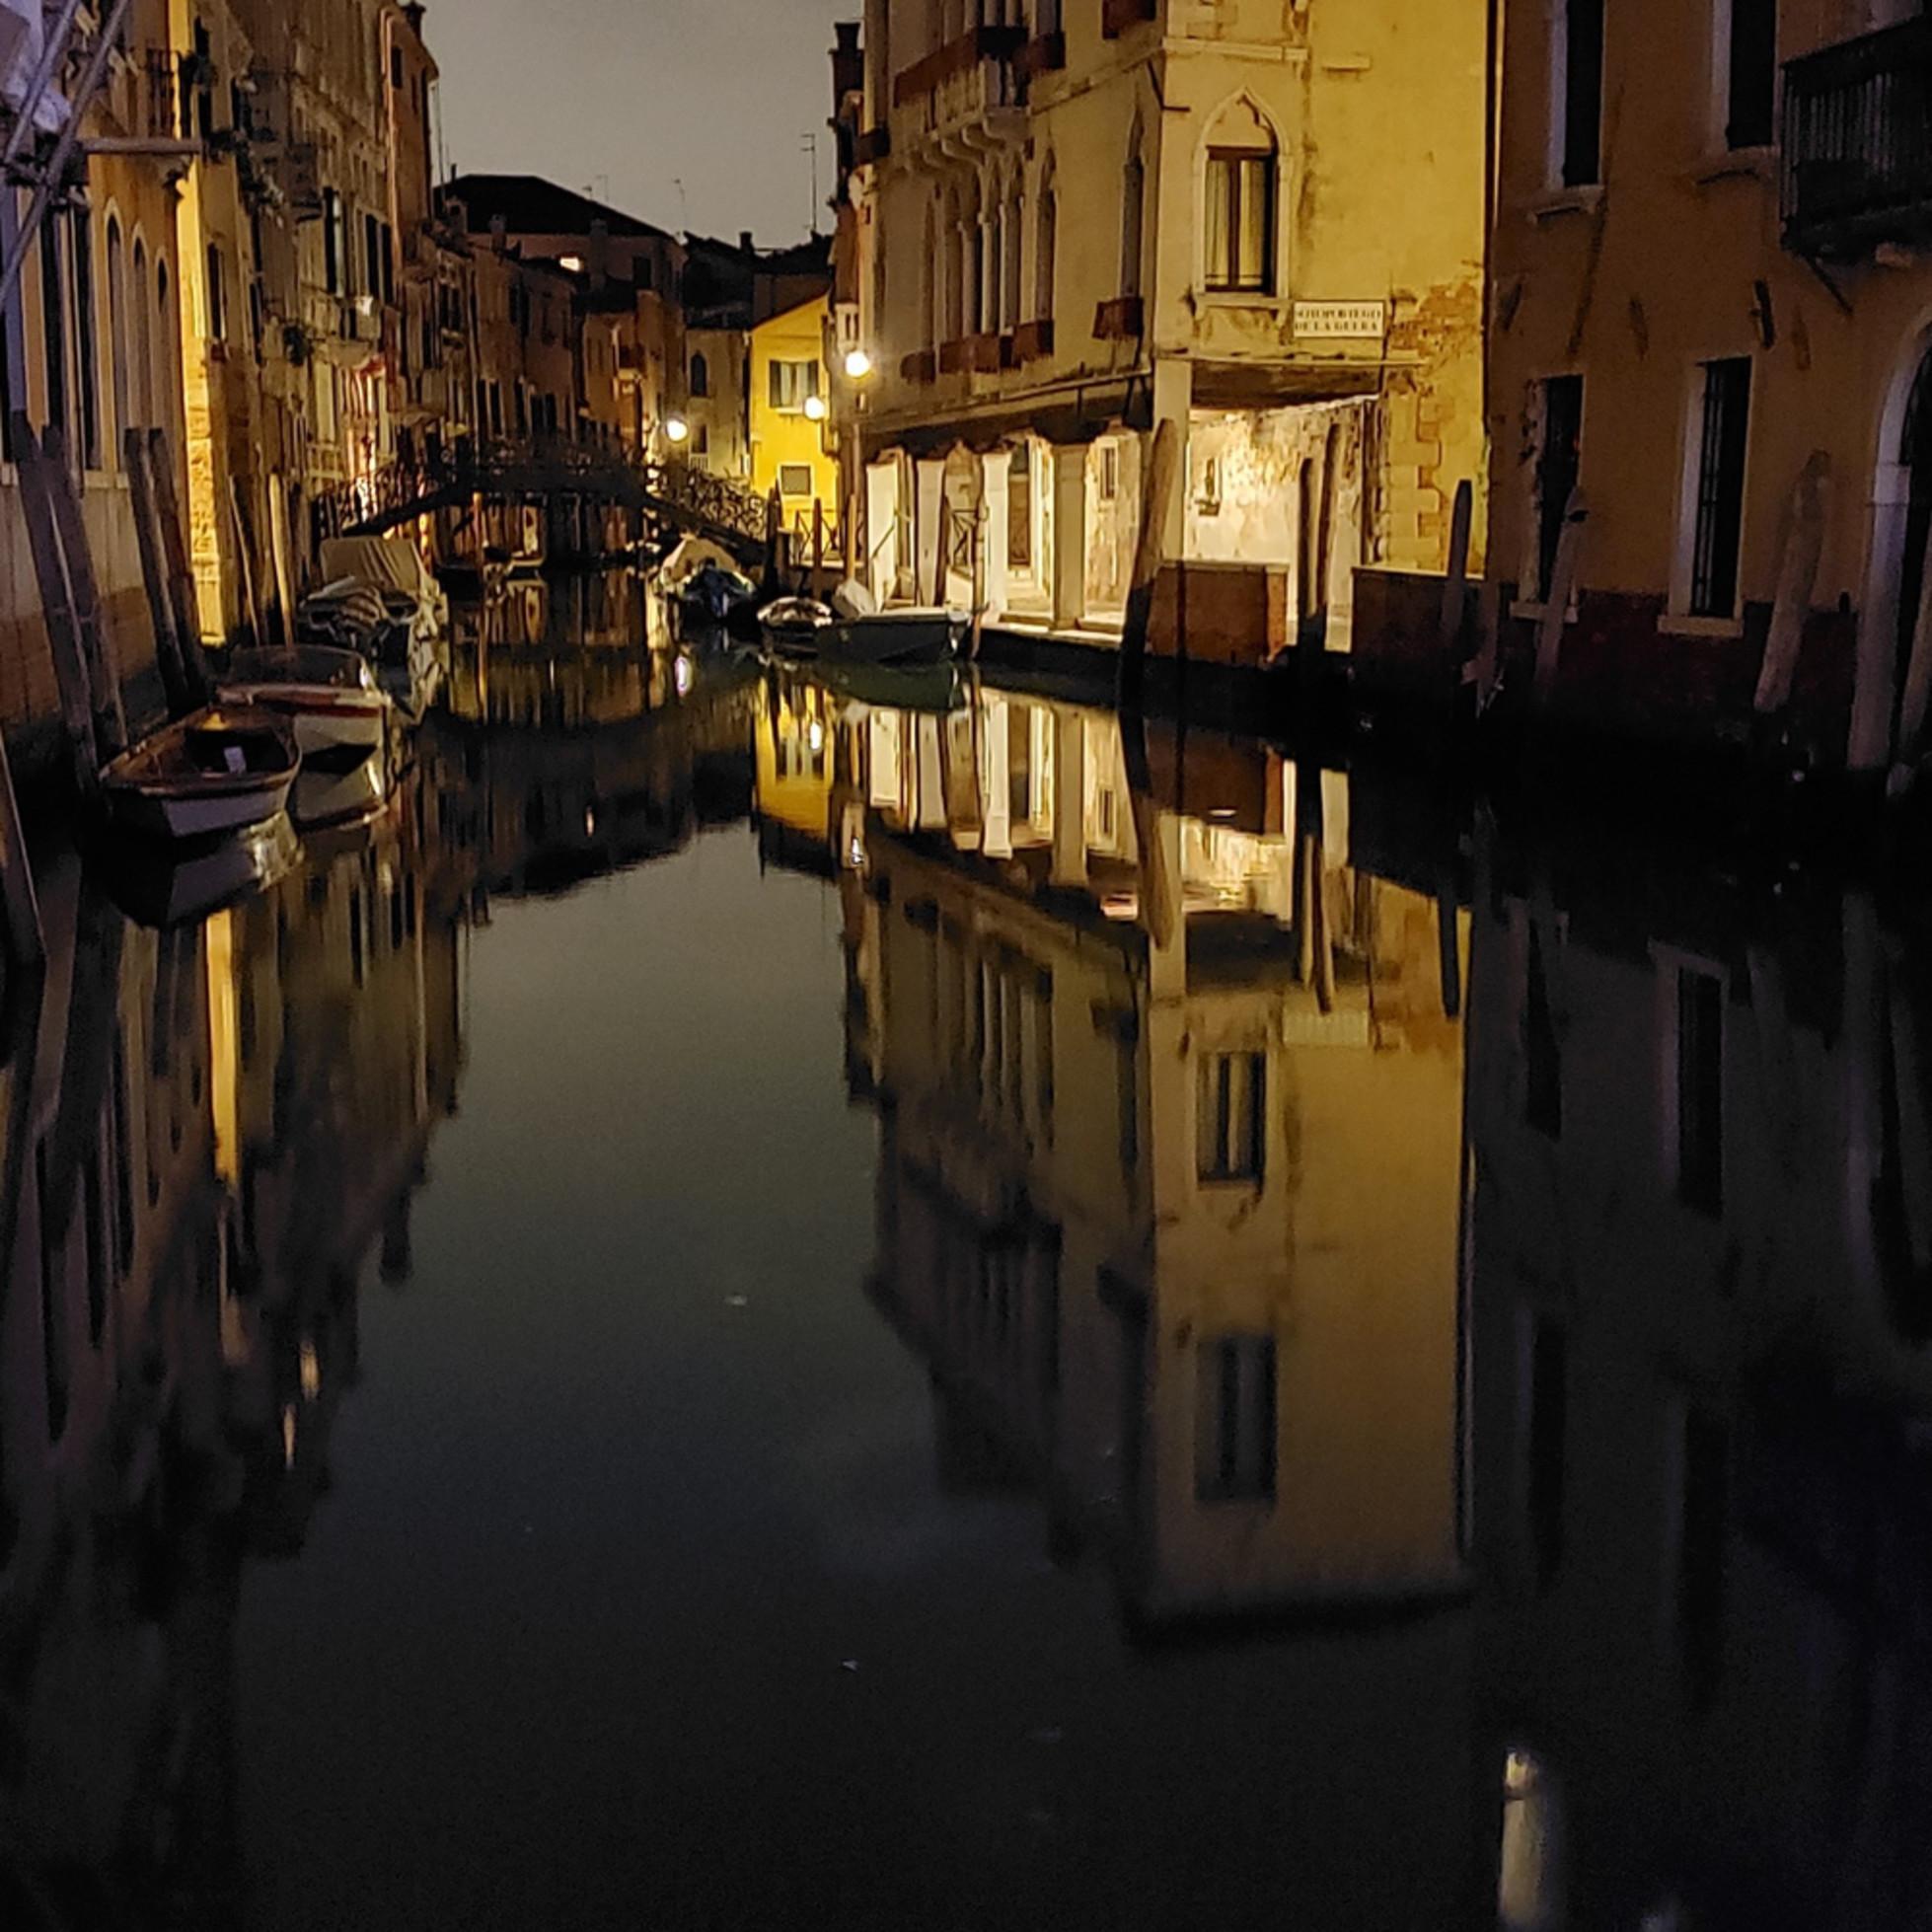 Veniceeveningreflectionsr2otate 20190930 215705 trxktn